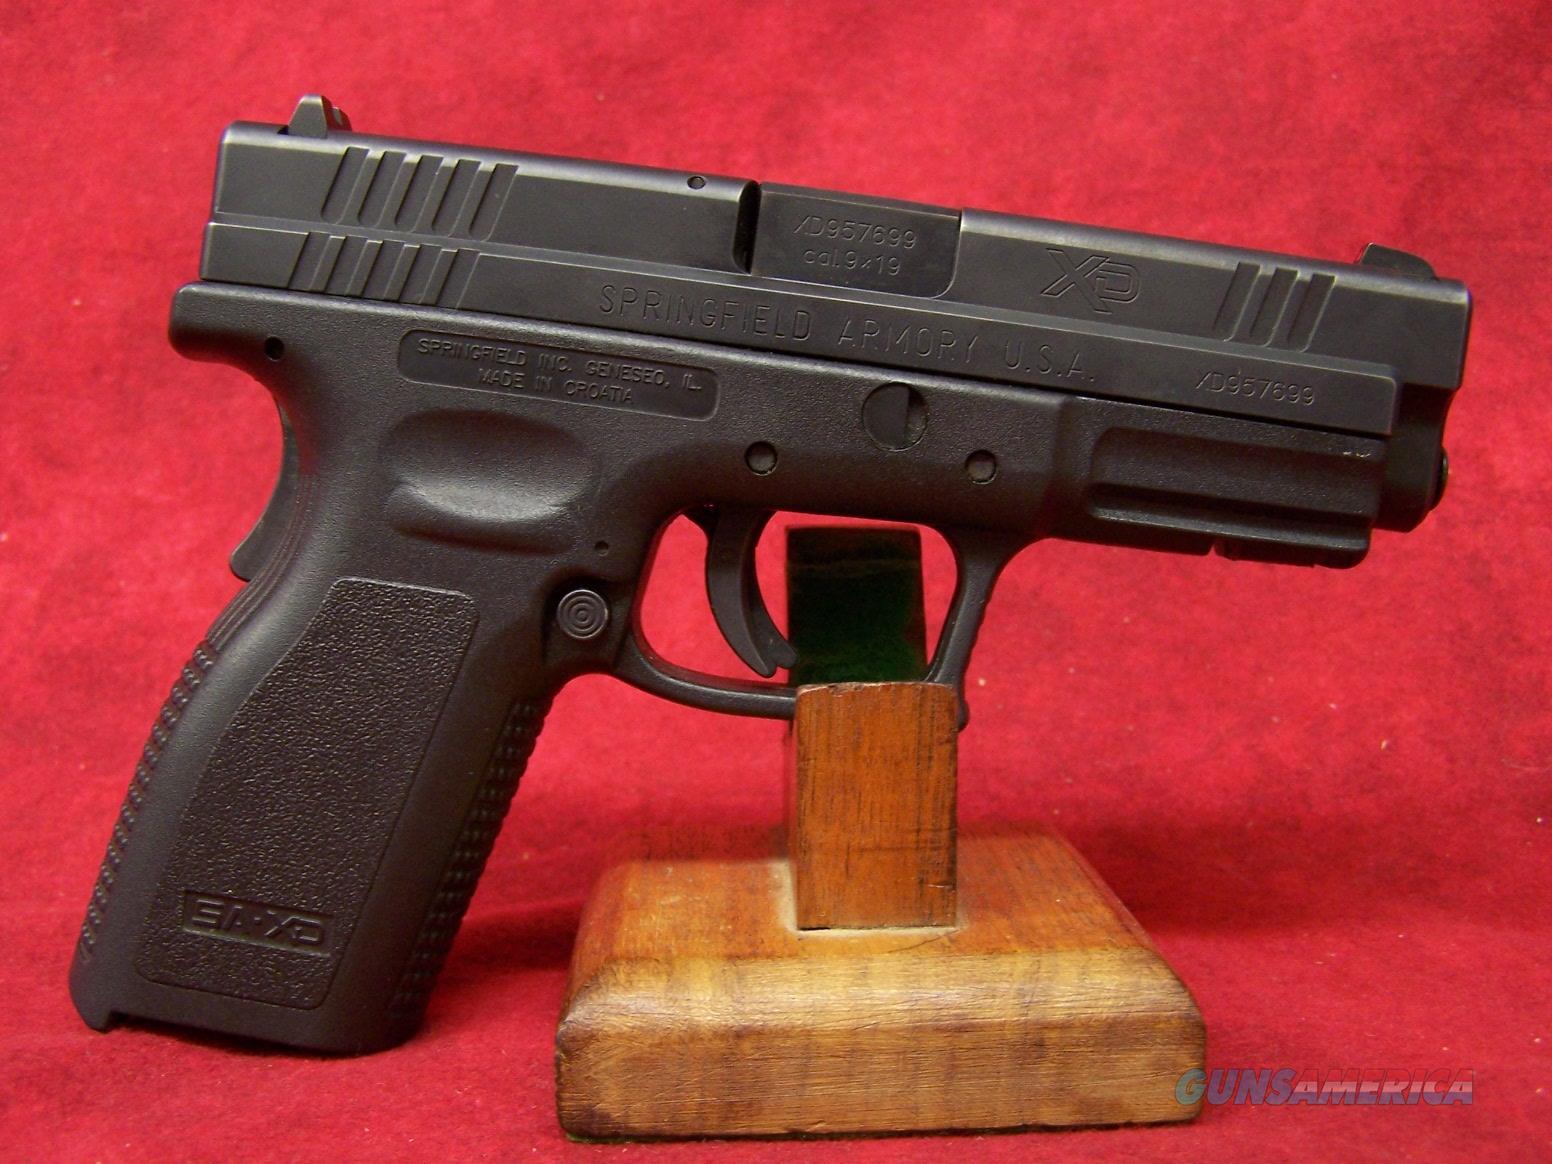 "Springfield XD-9 9mm 4"" Barrel (XD9101HCSP06)  Guns > Pistols > Springfield Armory Pistols > XD (eXtreme Duty)"